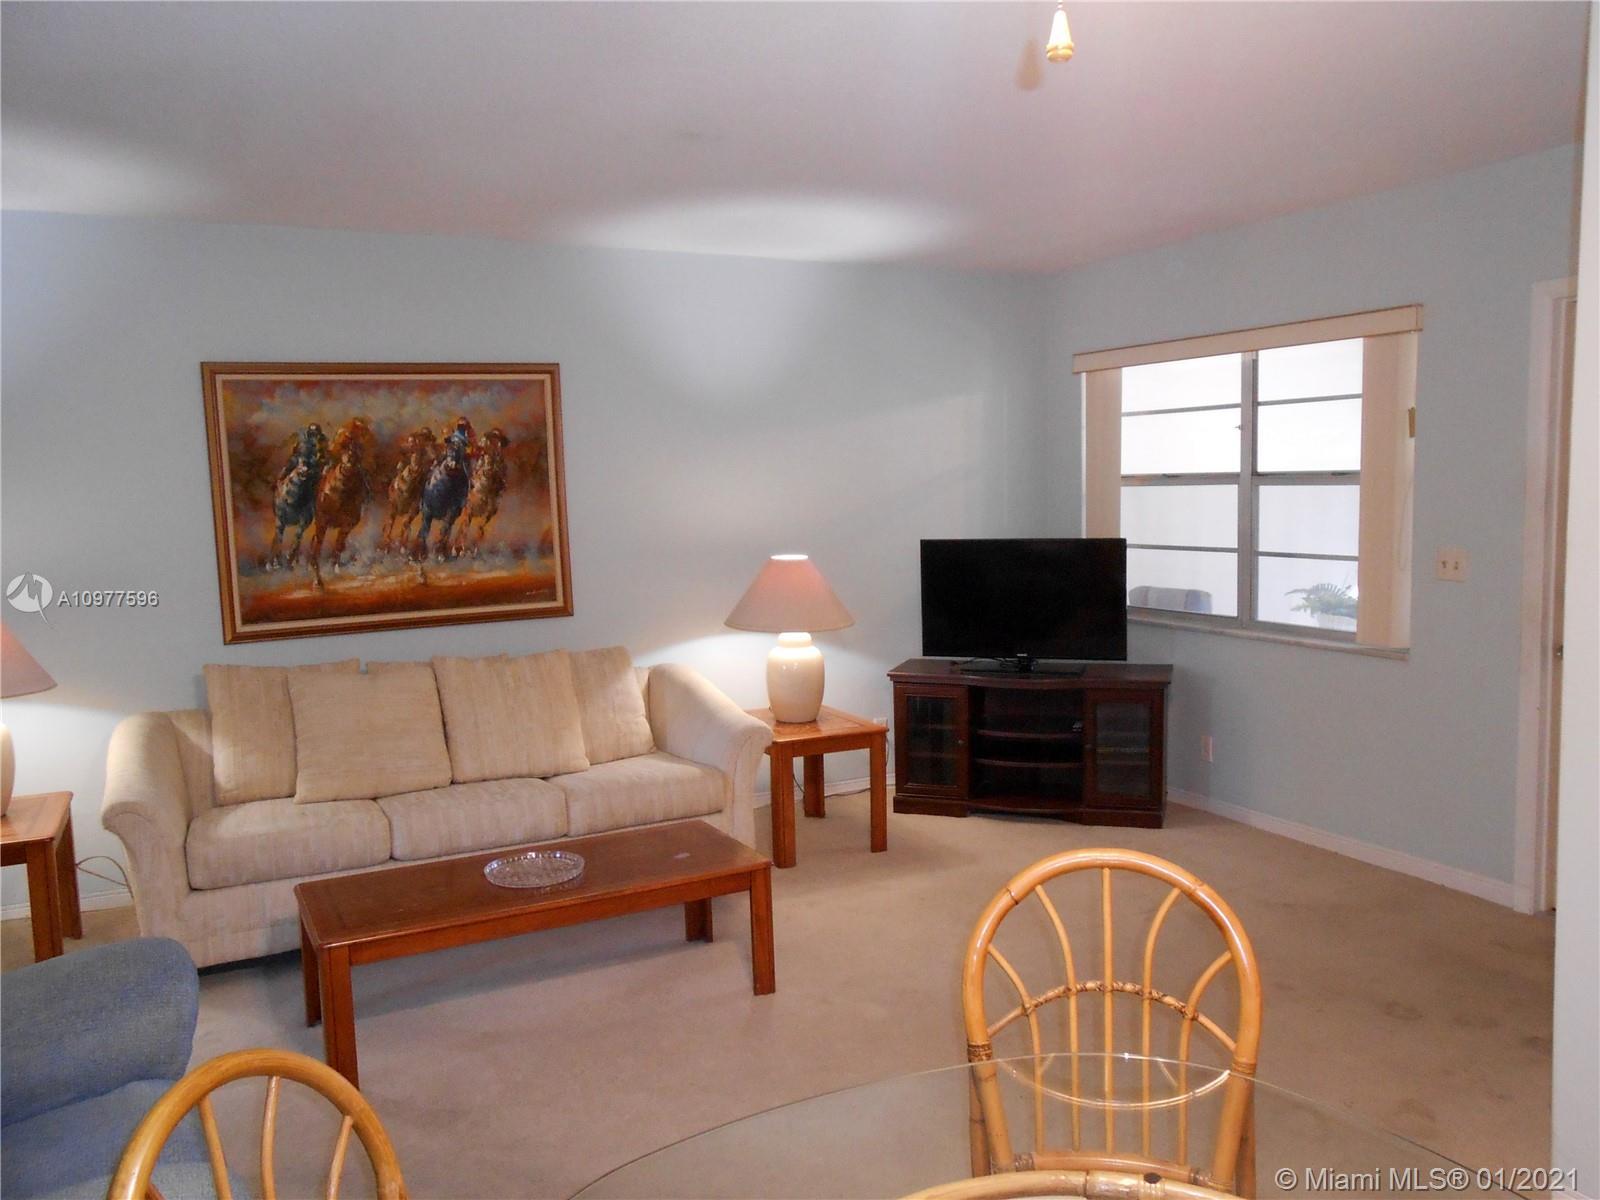 581 Blue Heron Dr # B, Hallandale Beach, Florida 33009, 1 Bedroom Bedrooms, ,1 BathroomBathrooms,Residential,For Sale,581 Blue Heron Dr # B,A10977596